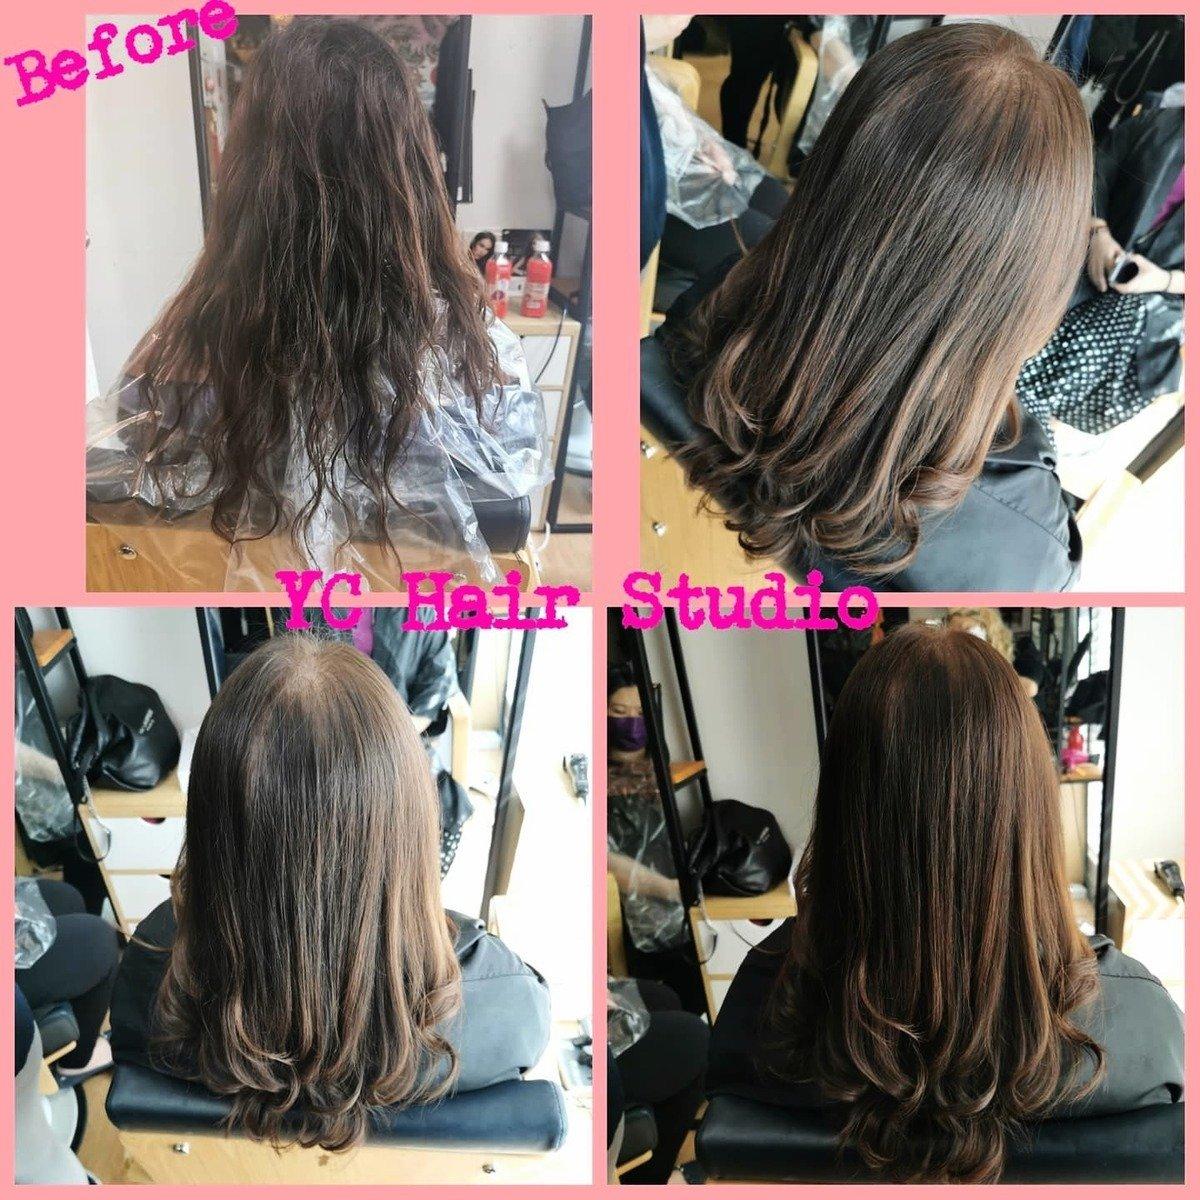 Yoanna分享,對於客人的要求,她儘量滿足,但達不到效果時她寧願放棄不做,只要她經手做的,就要做到客人滿意。(YC Hair Designer Facebook)